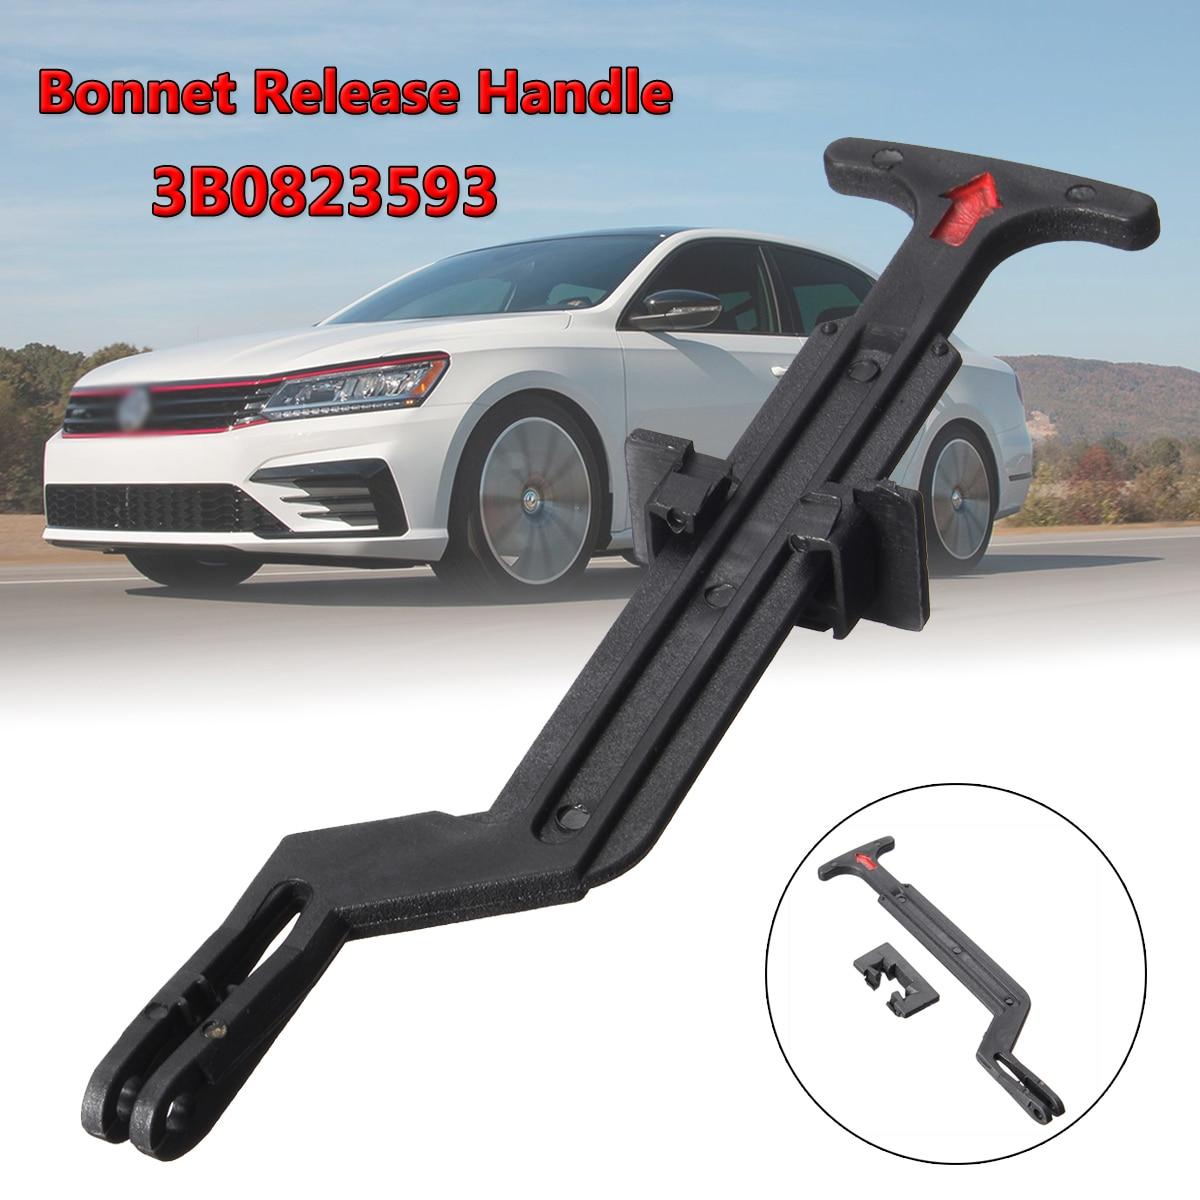 1pc 3B0823593 Bonnet Hood Release Rod Lock Latch Handle for VW Passat B5 B5.5 1998 1999 2000 2001 2002 2003 2004